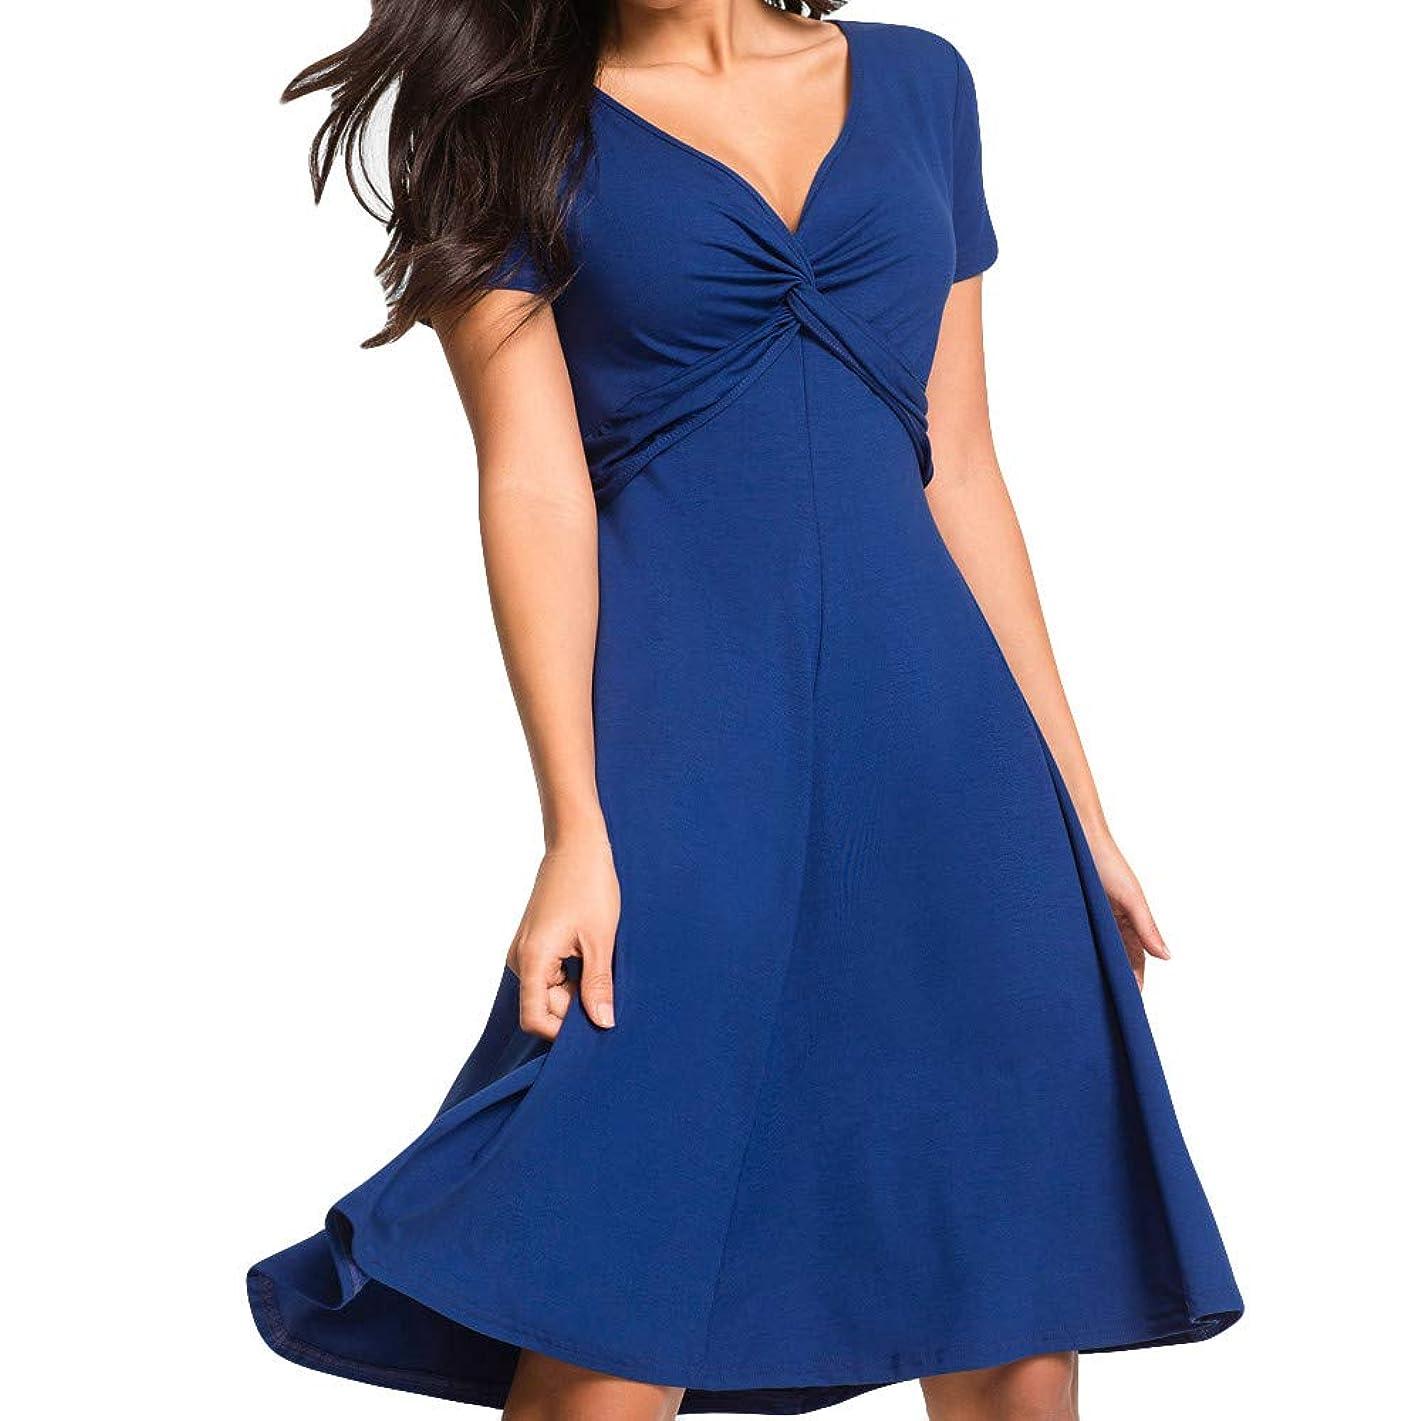 STORTO Women Solid Plus Size Short Sleeve V Neck Casual Beach Sundress Evening Party Mini Dresses